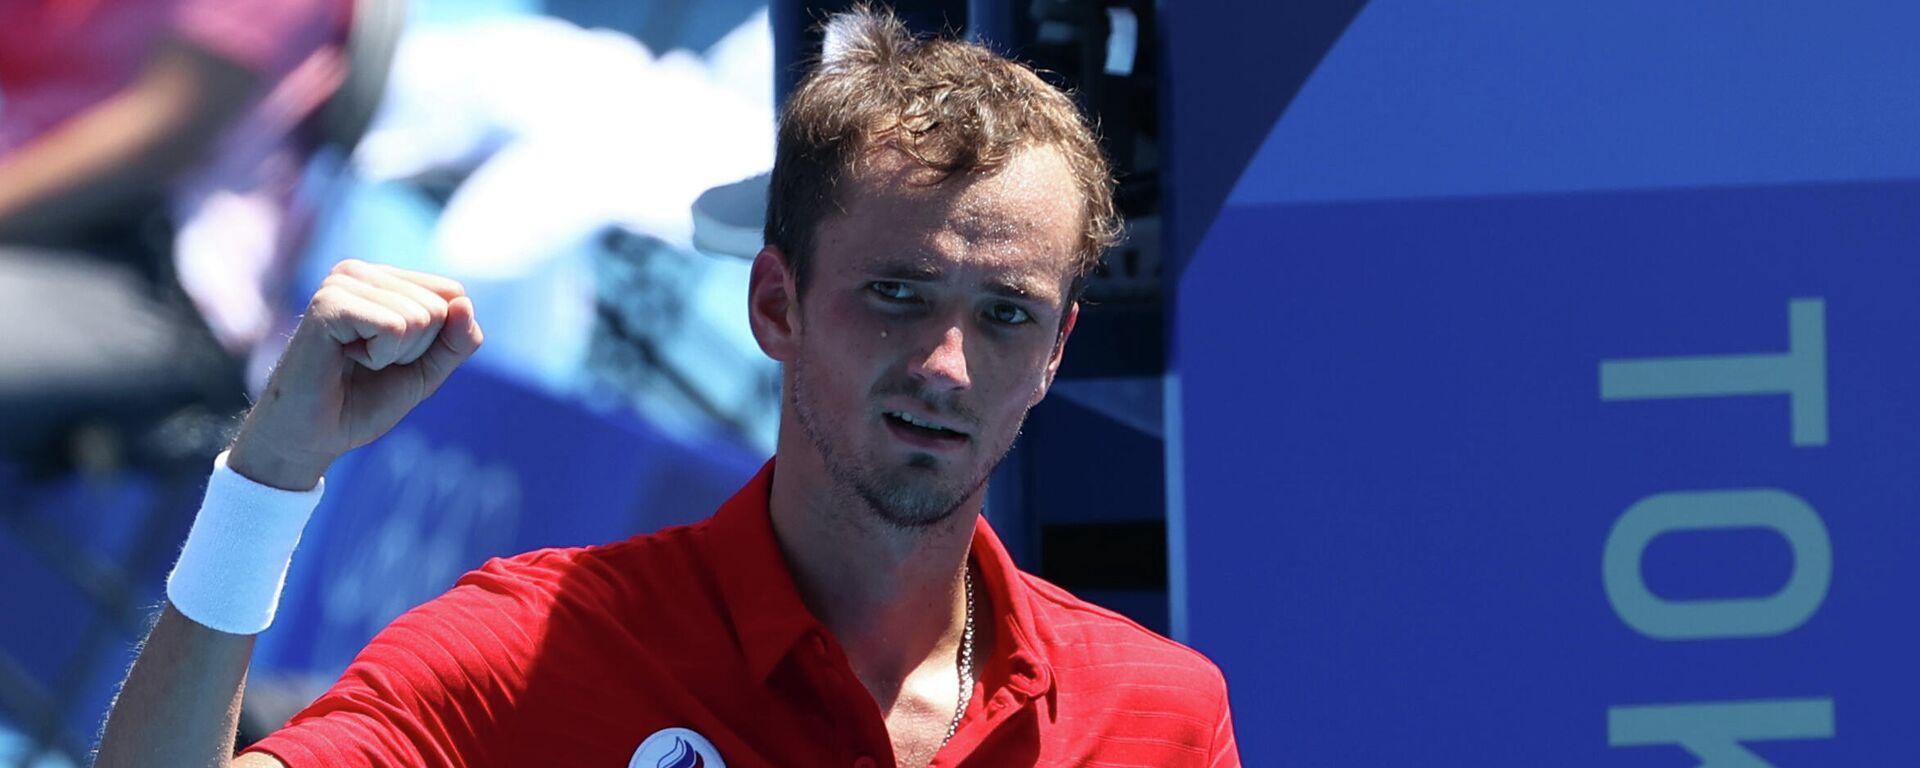 El tenista ruso Daniil Medvédev - Sputnik Mundo, 1920, 29.07.2021